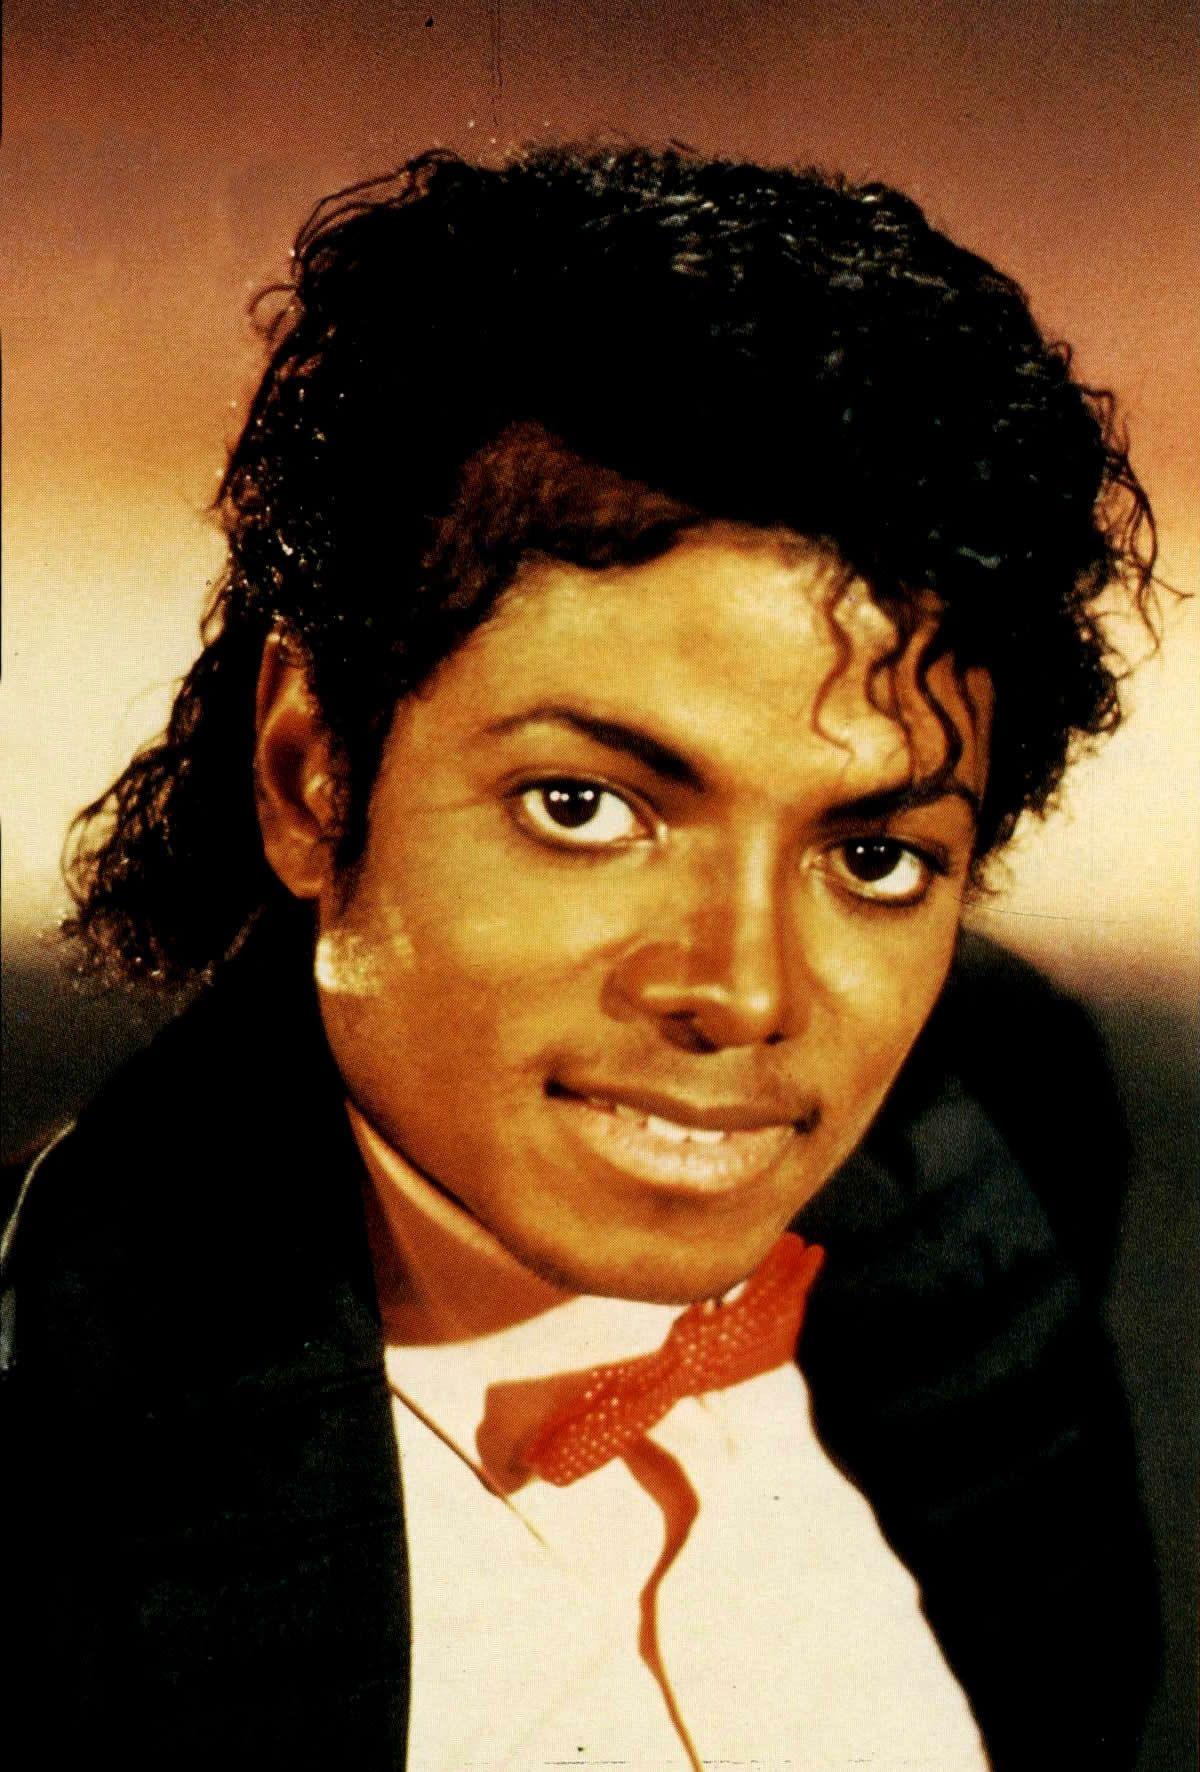 Michael Jackson Photo Billie Jean Michael Jackson Poster Michael Jackson Thriller Michael Jackson